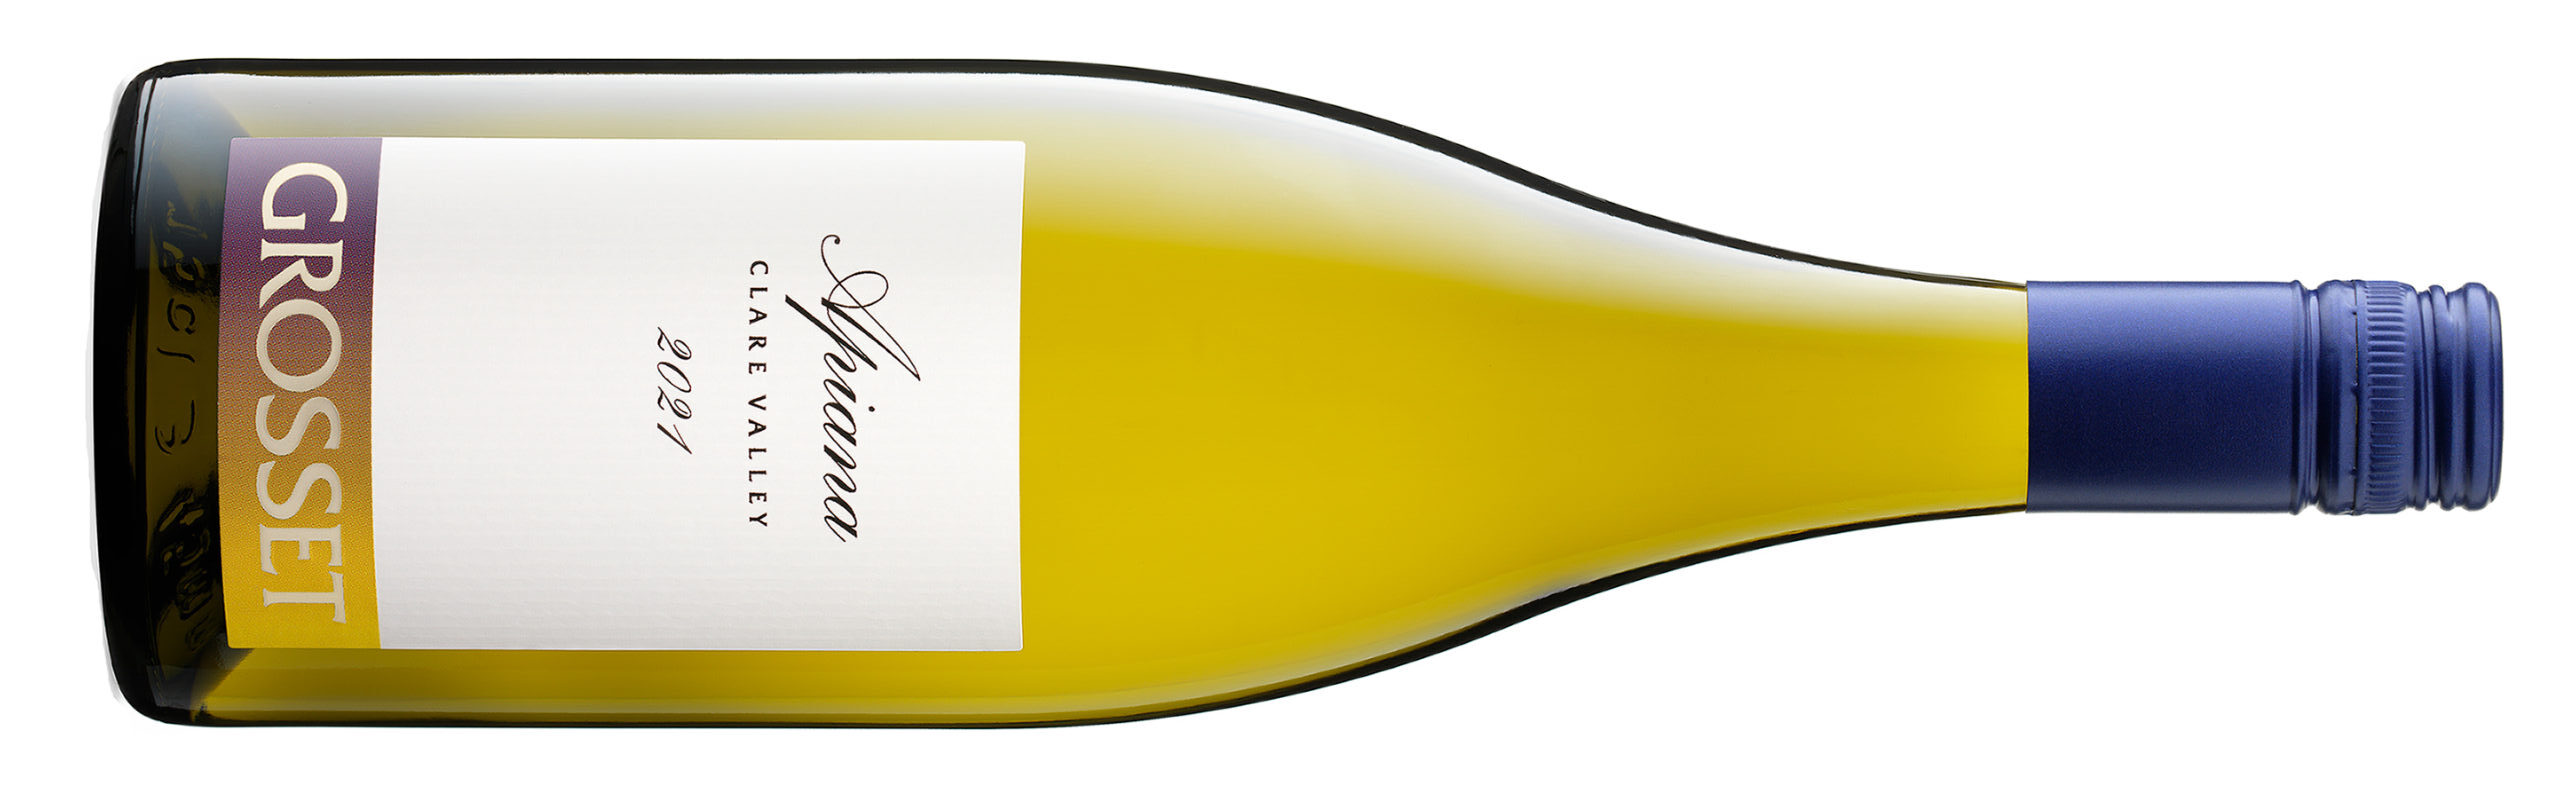 Bottle image of Grosset Apiana 2021